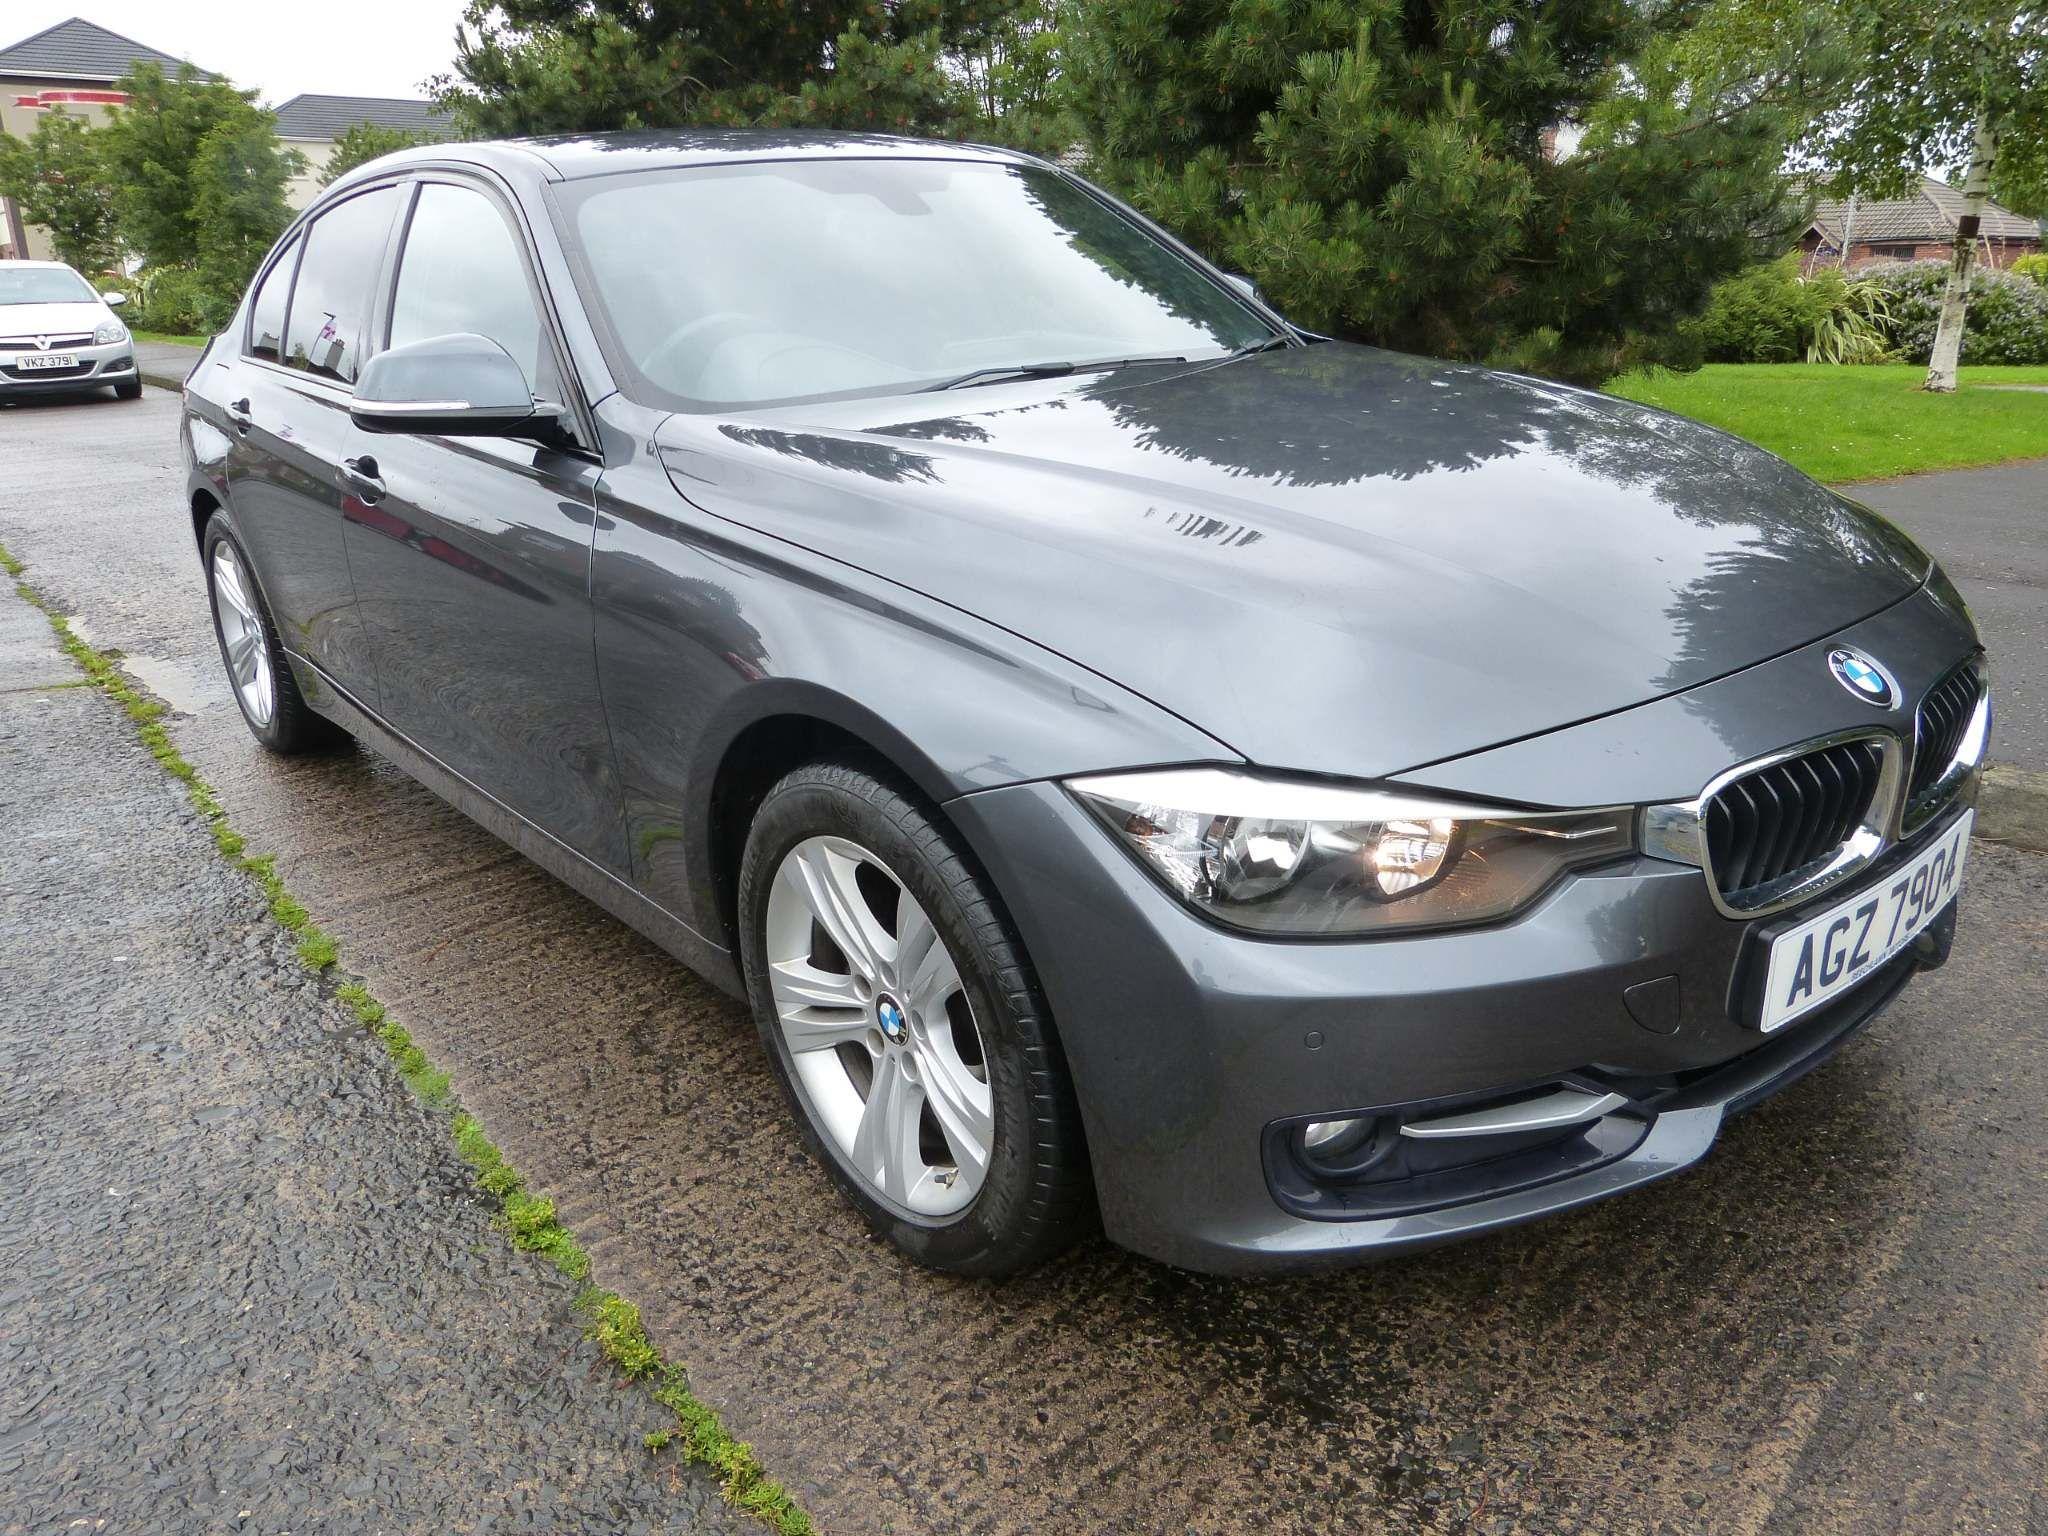 2015 BMW 3 Series 2.0 320d Sport (s/s) Diesel Automatic  – Beechlawn Motors Belfast